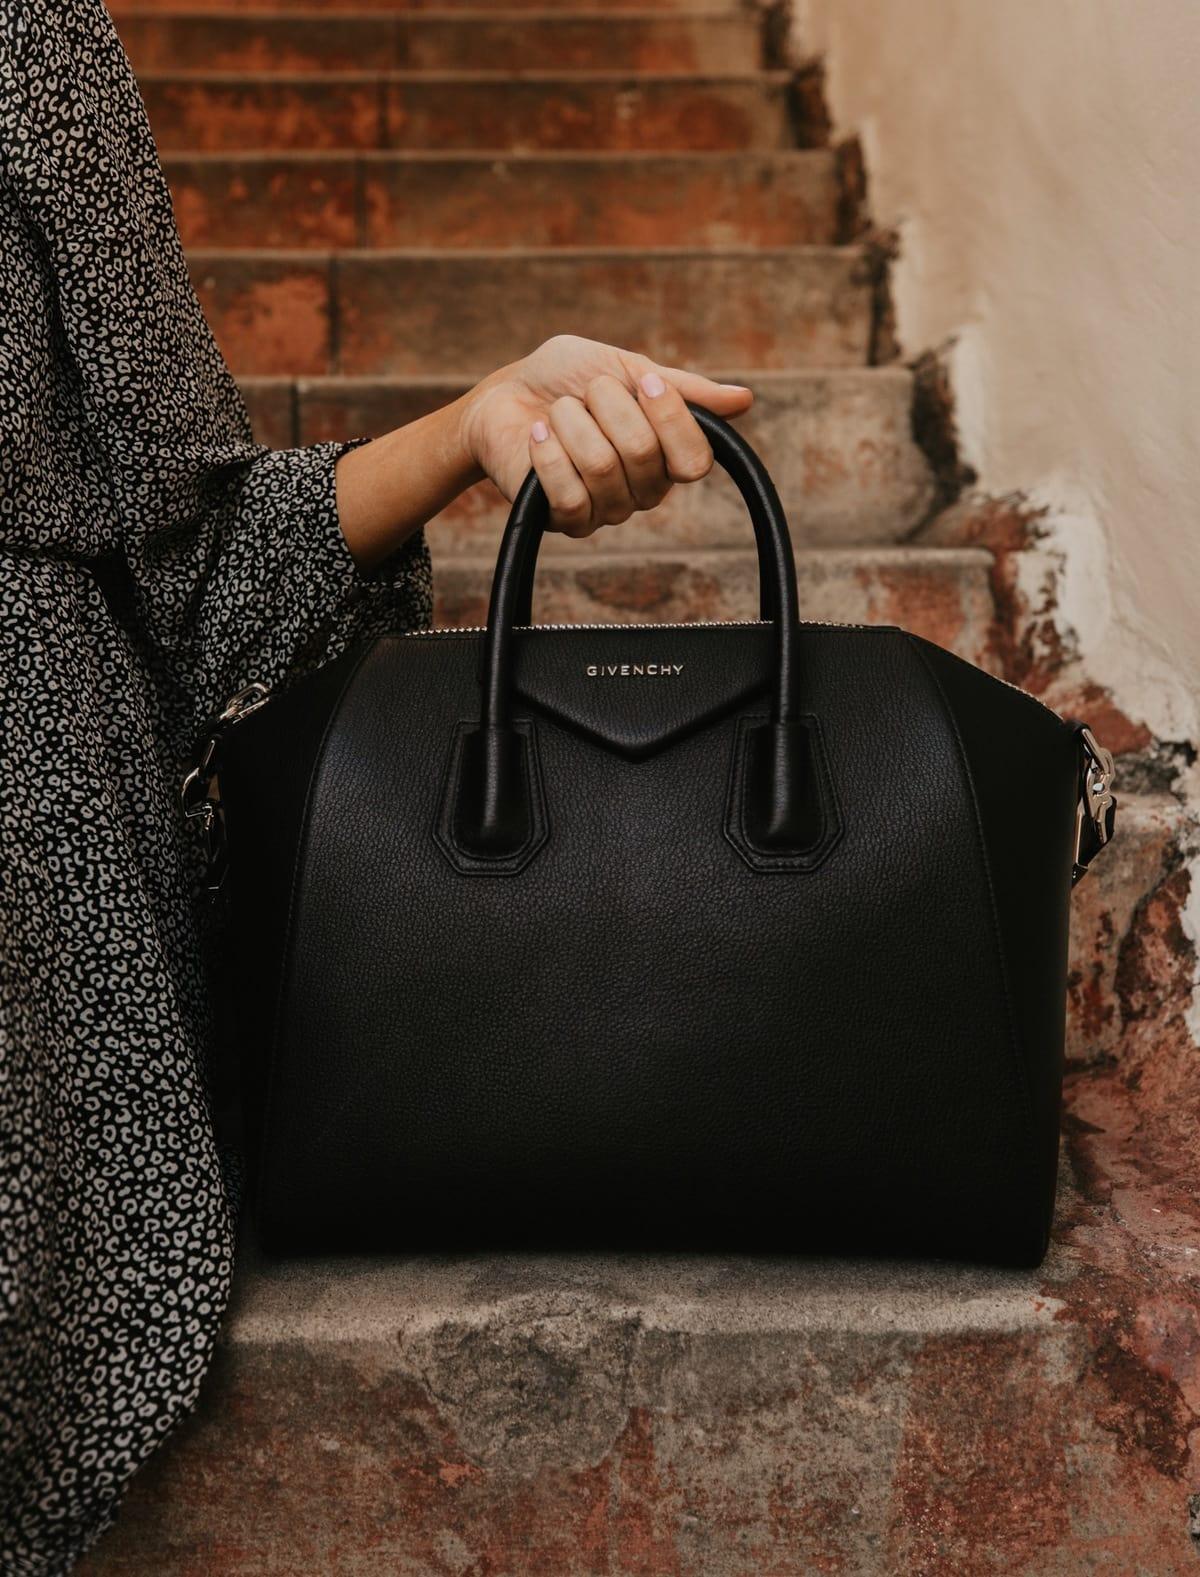 givenchy satchel